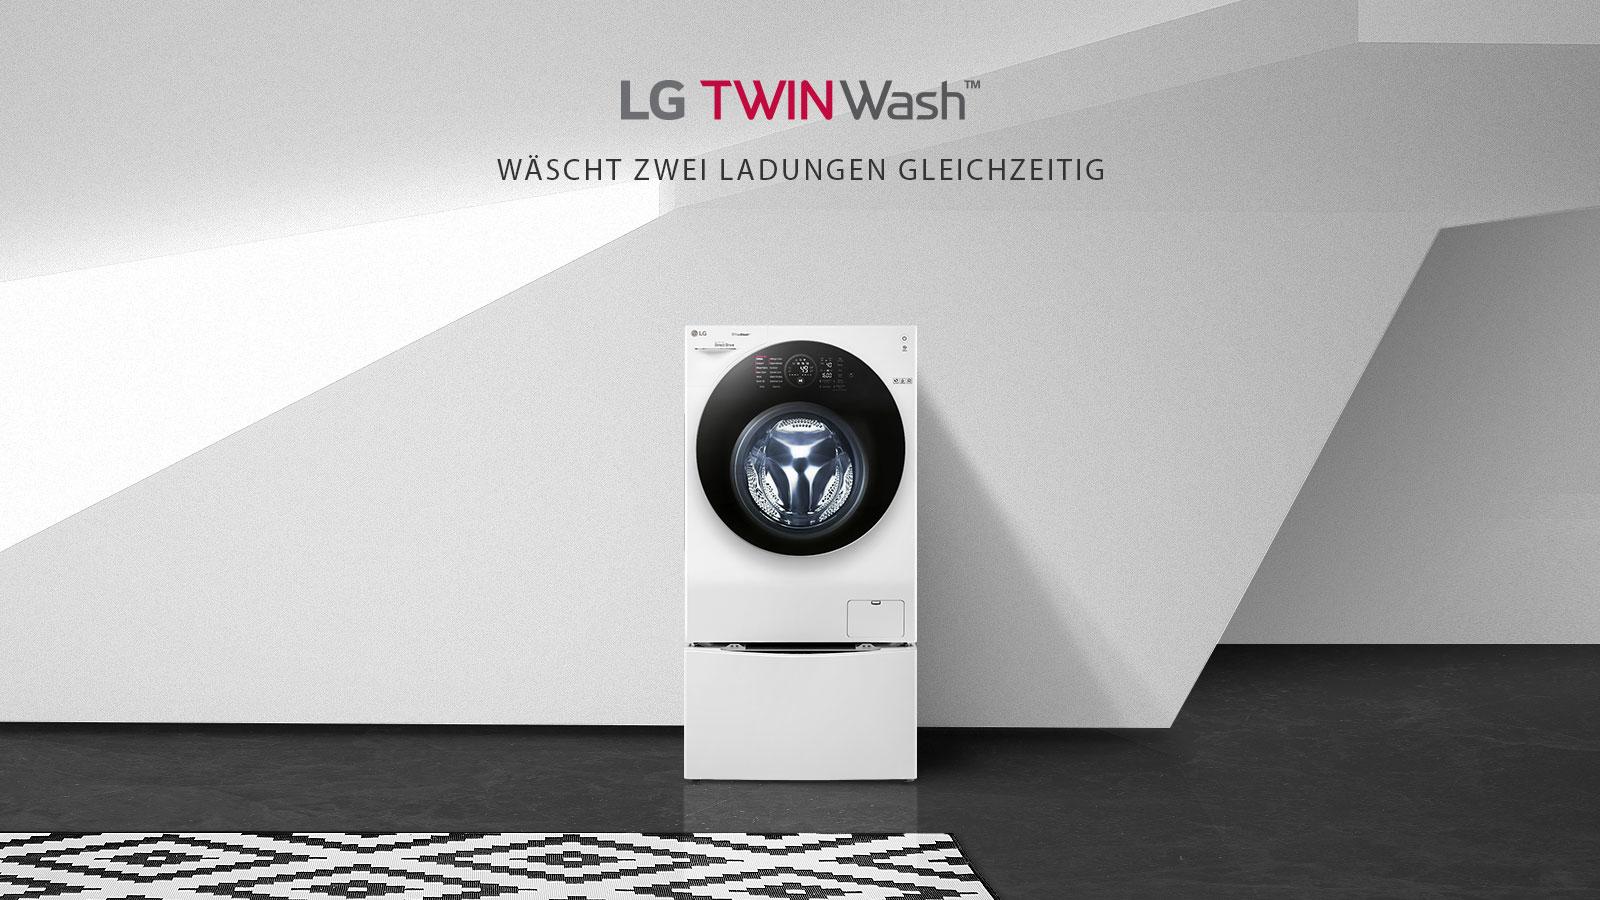 lg twinwash waschtrockner 12 8 kg kompatibel mit mini. Black Bedroom Furniture Sets. Home Design Ideas